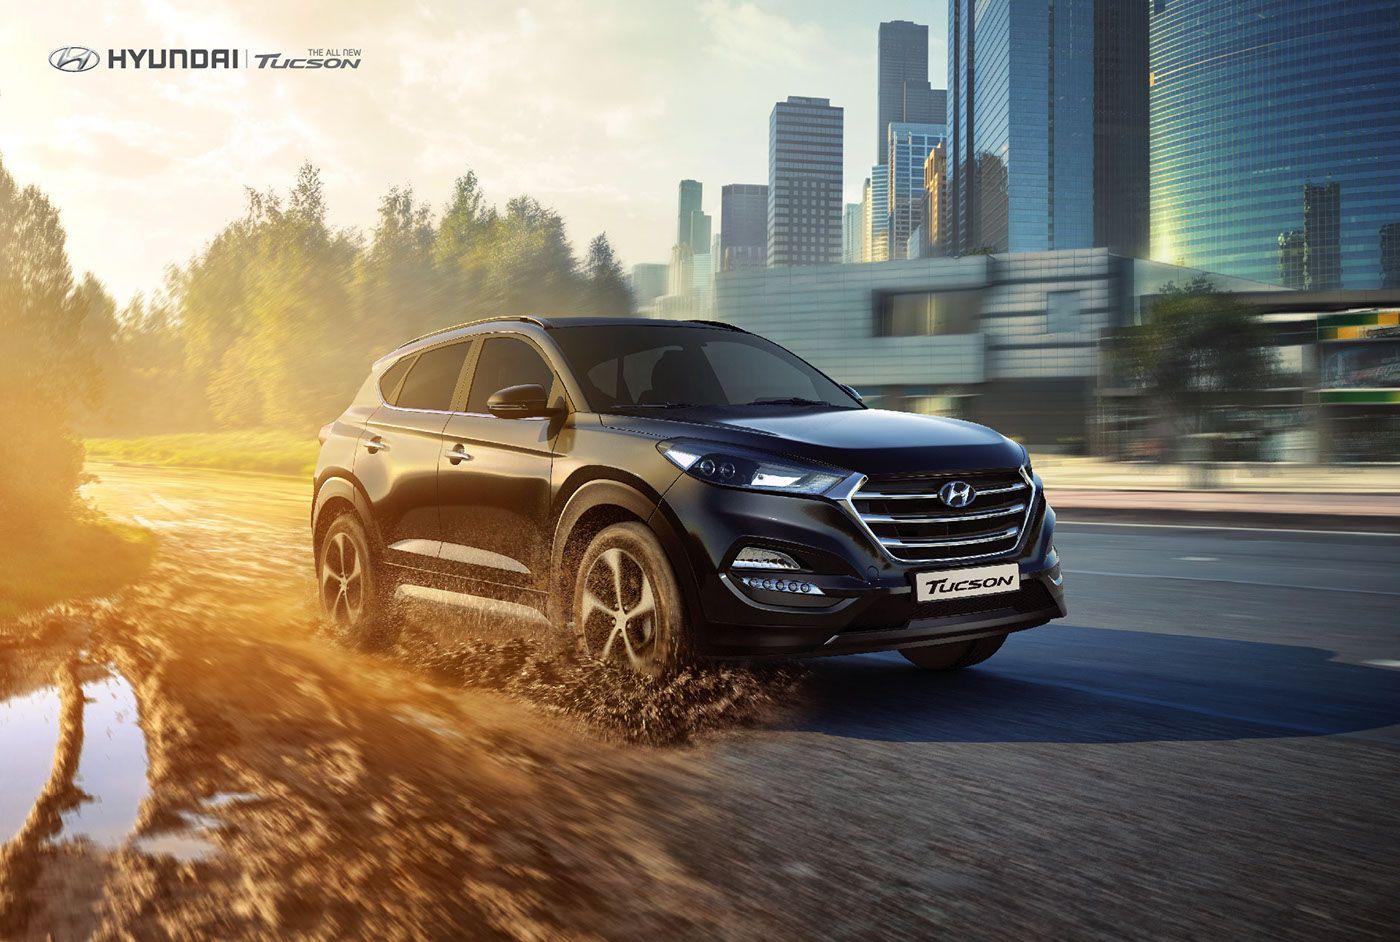 The All New Tucson Hyundai On Behance Publicidad En Autos